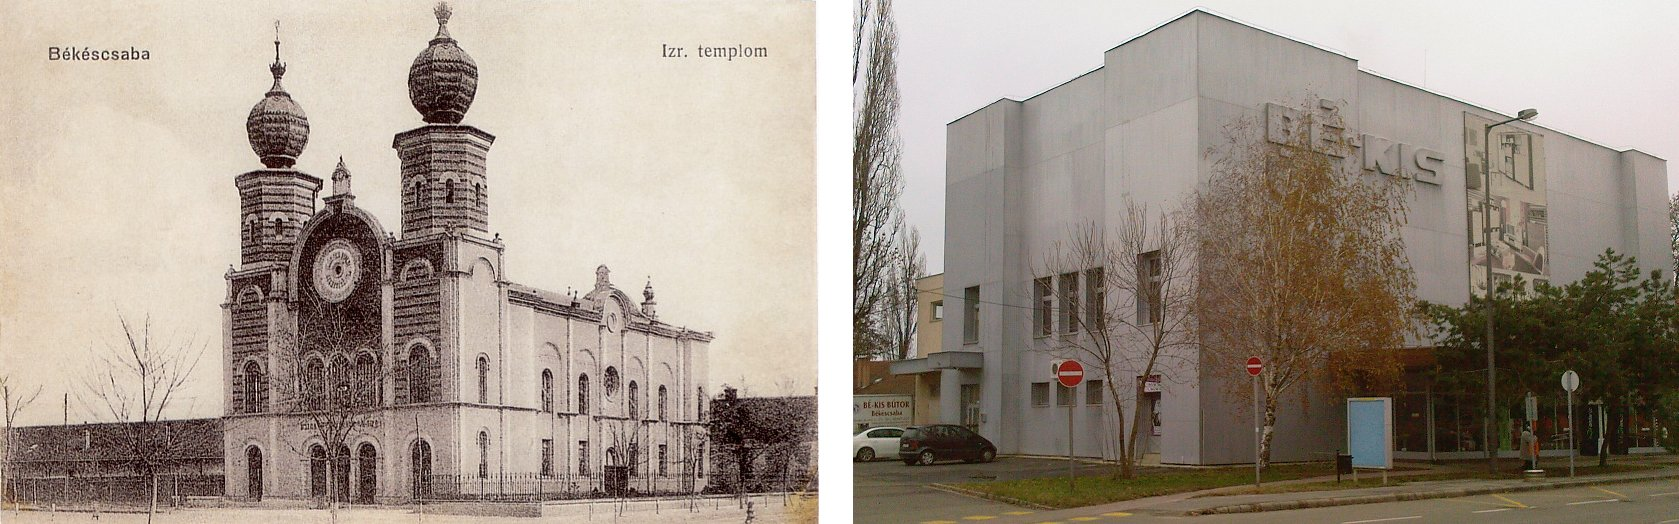 torony_zsinagoga.jpg